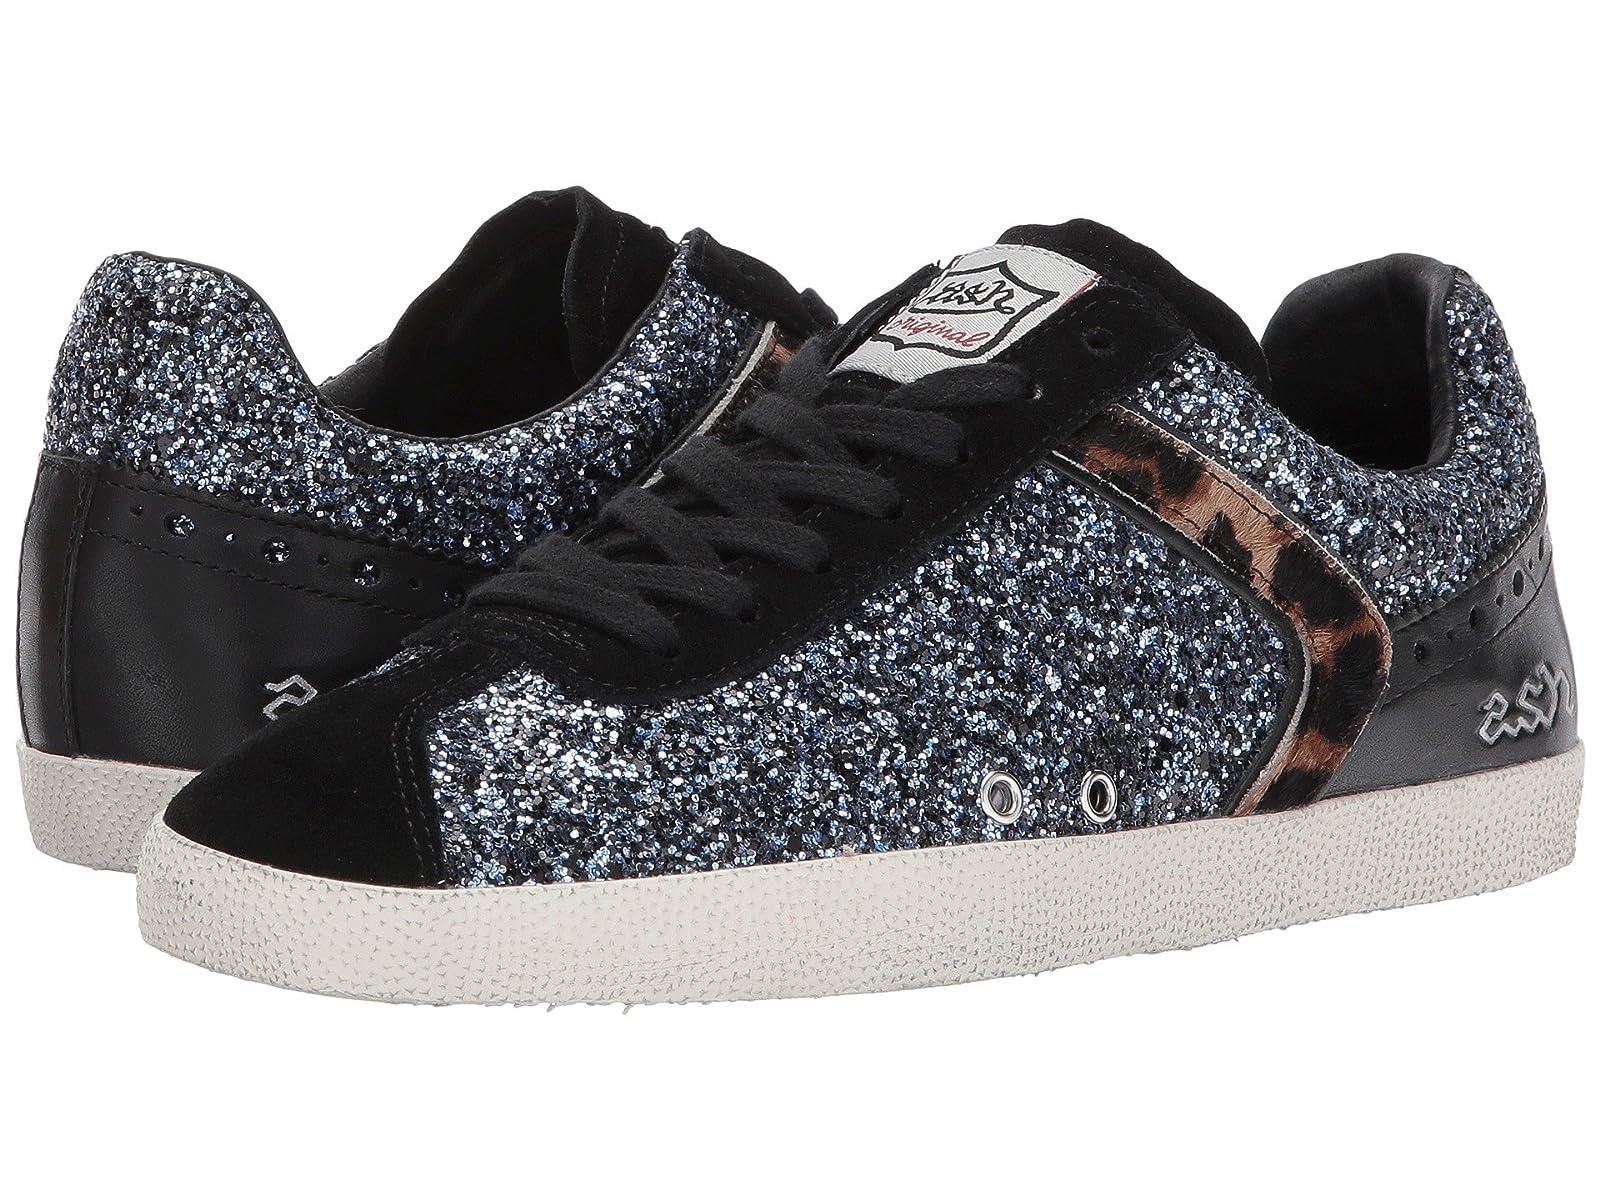 ASH GlitterCheap and distinctive eye-catching shoes